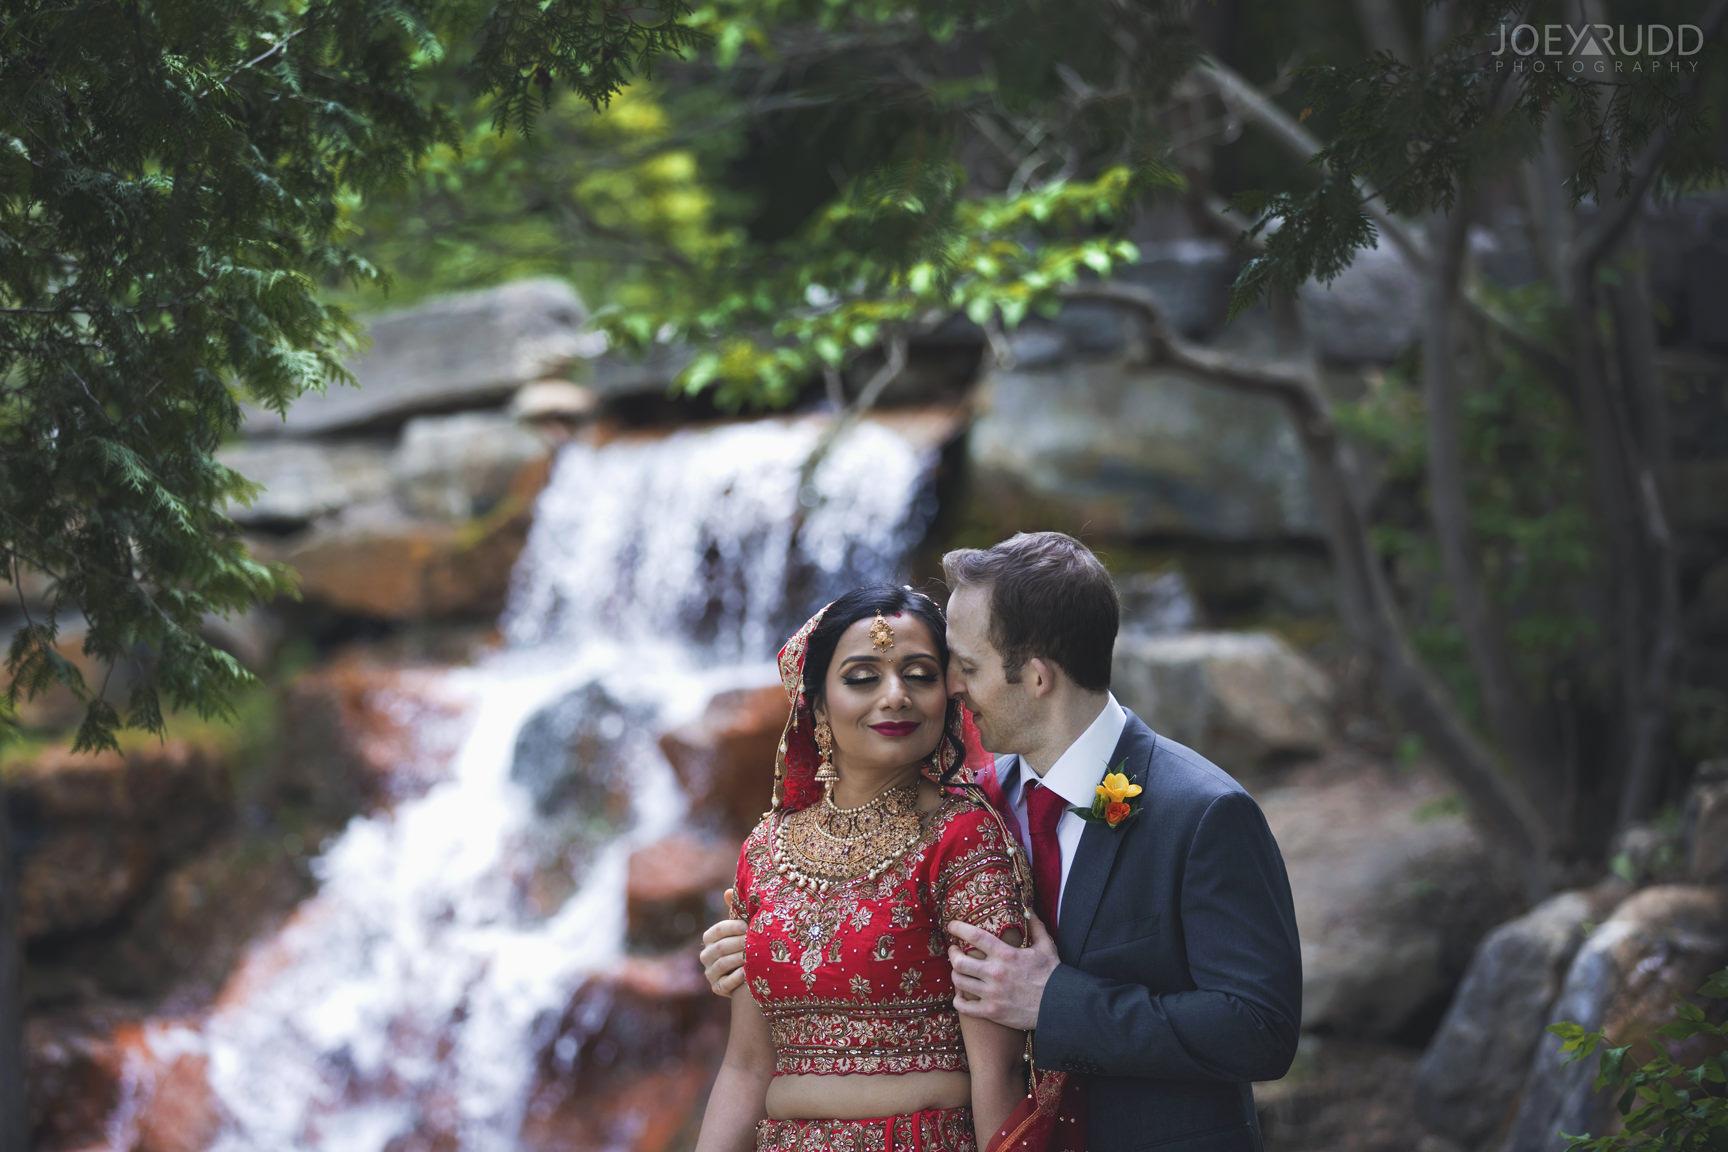 Ottawa Indian Wedding by Ottawa Wedding Photographer Joey Rudd Photography Andrew Haydon Park Waterfall